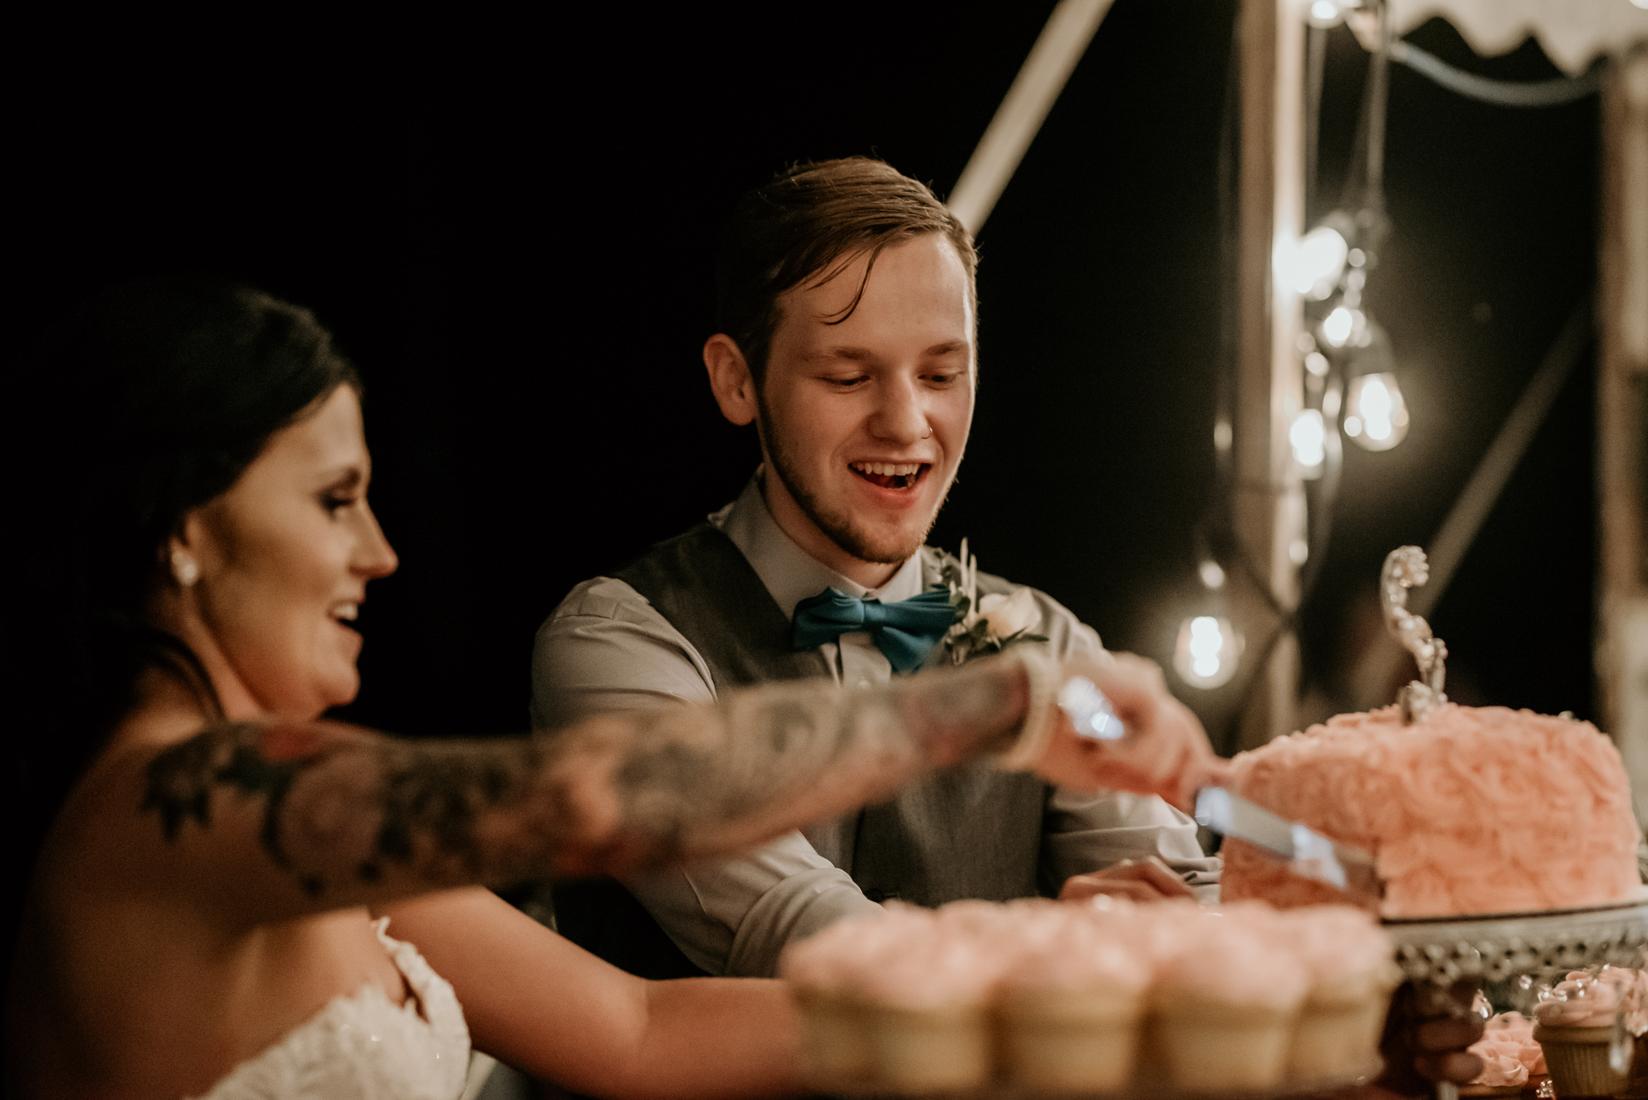 olivia_zay_wedding_09_2018-7991.jpg